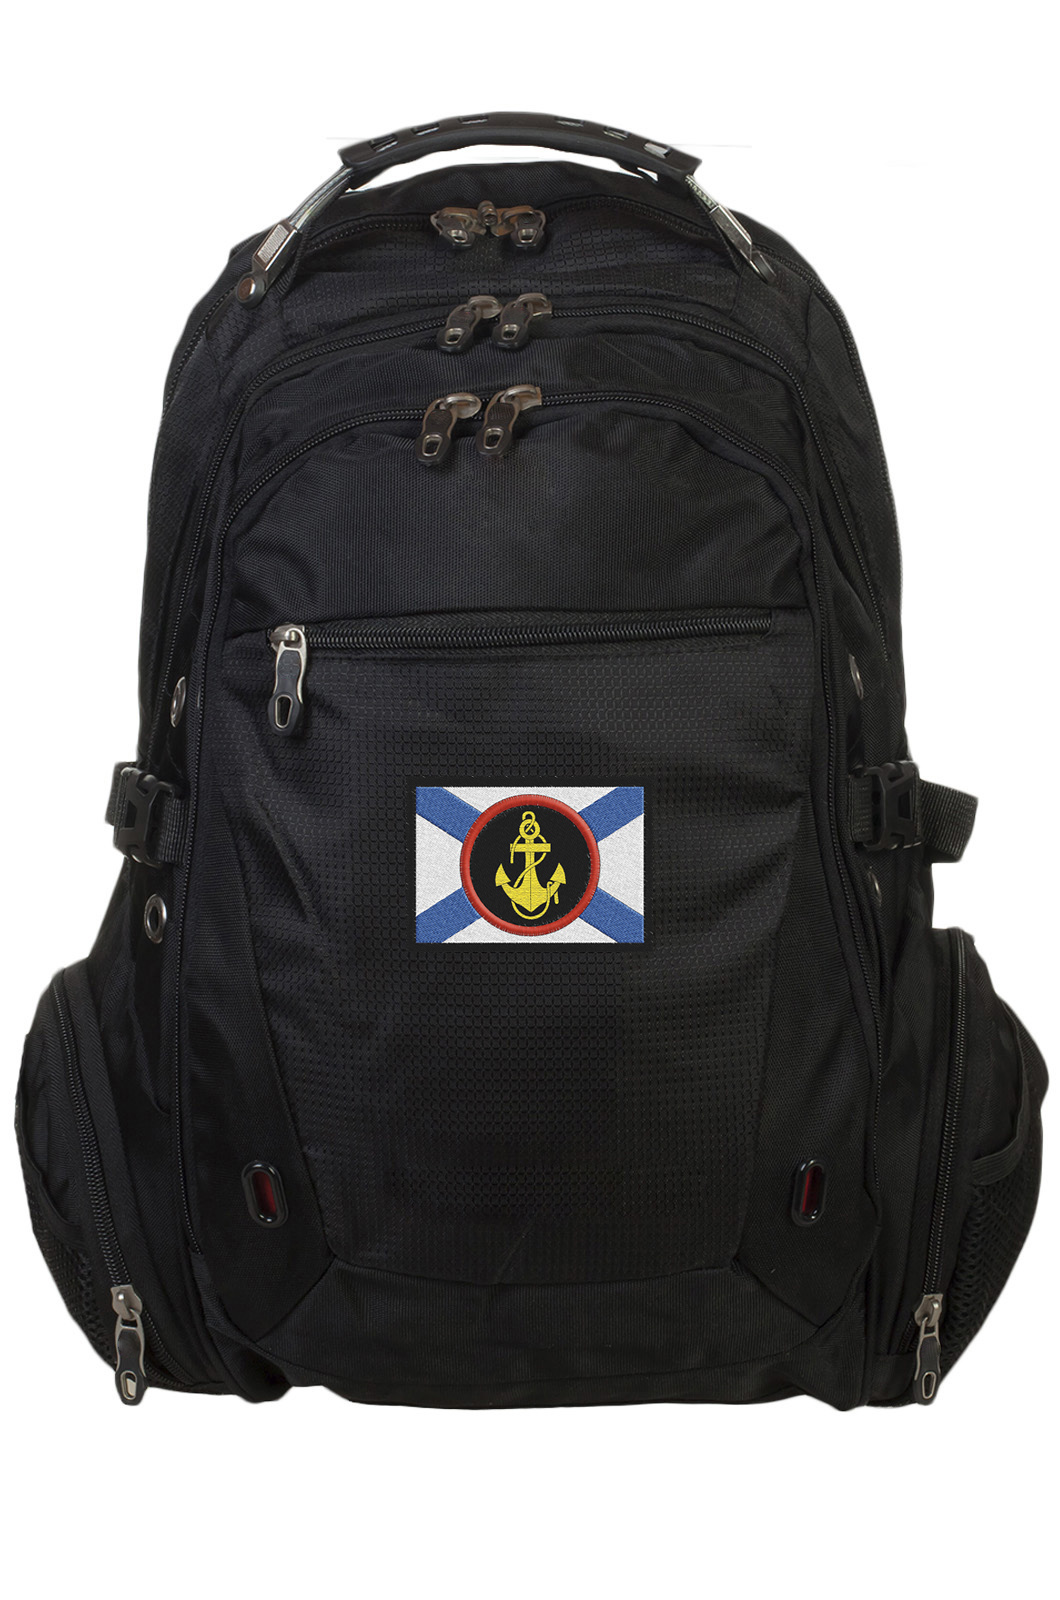 Молодежный рюкзак Морпеха